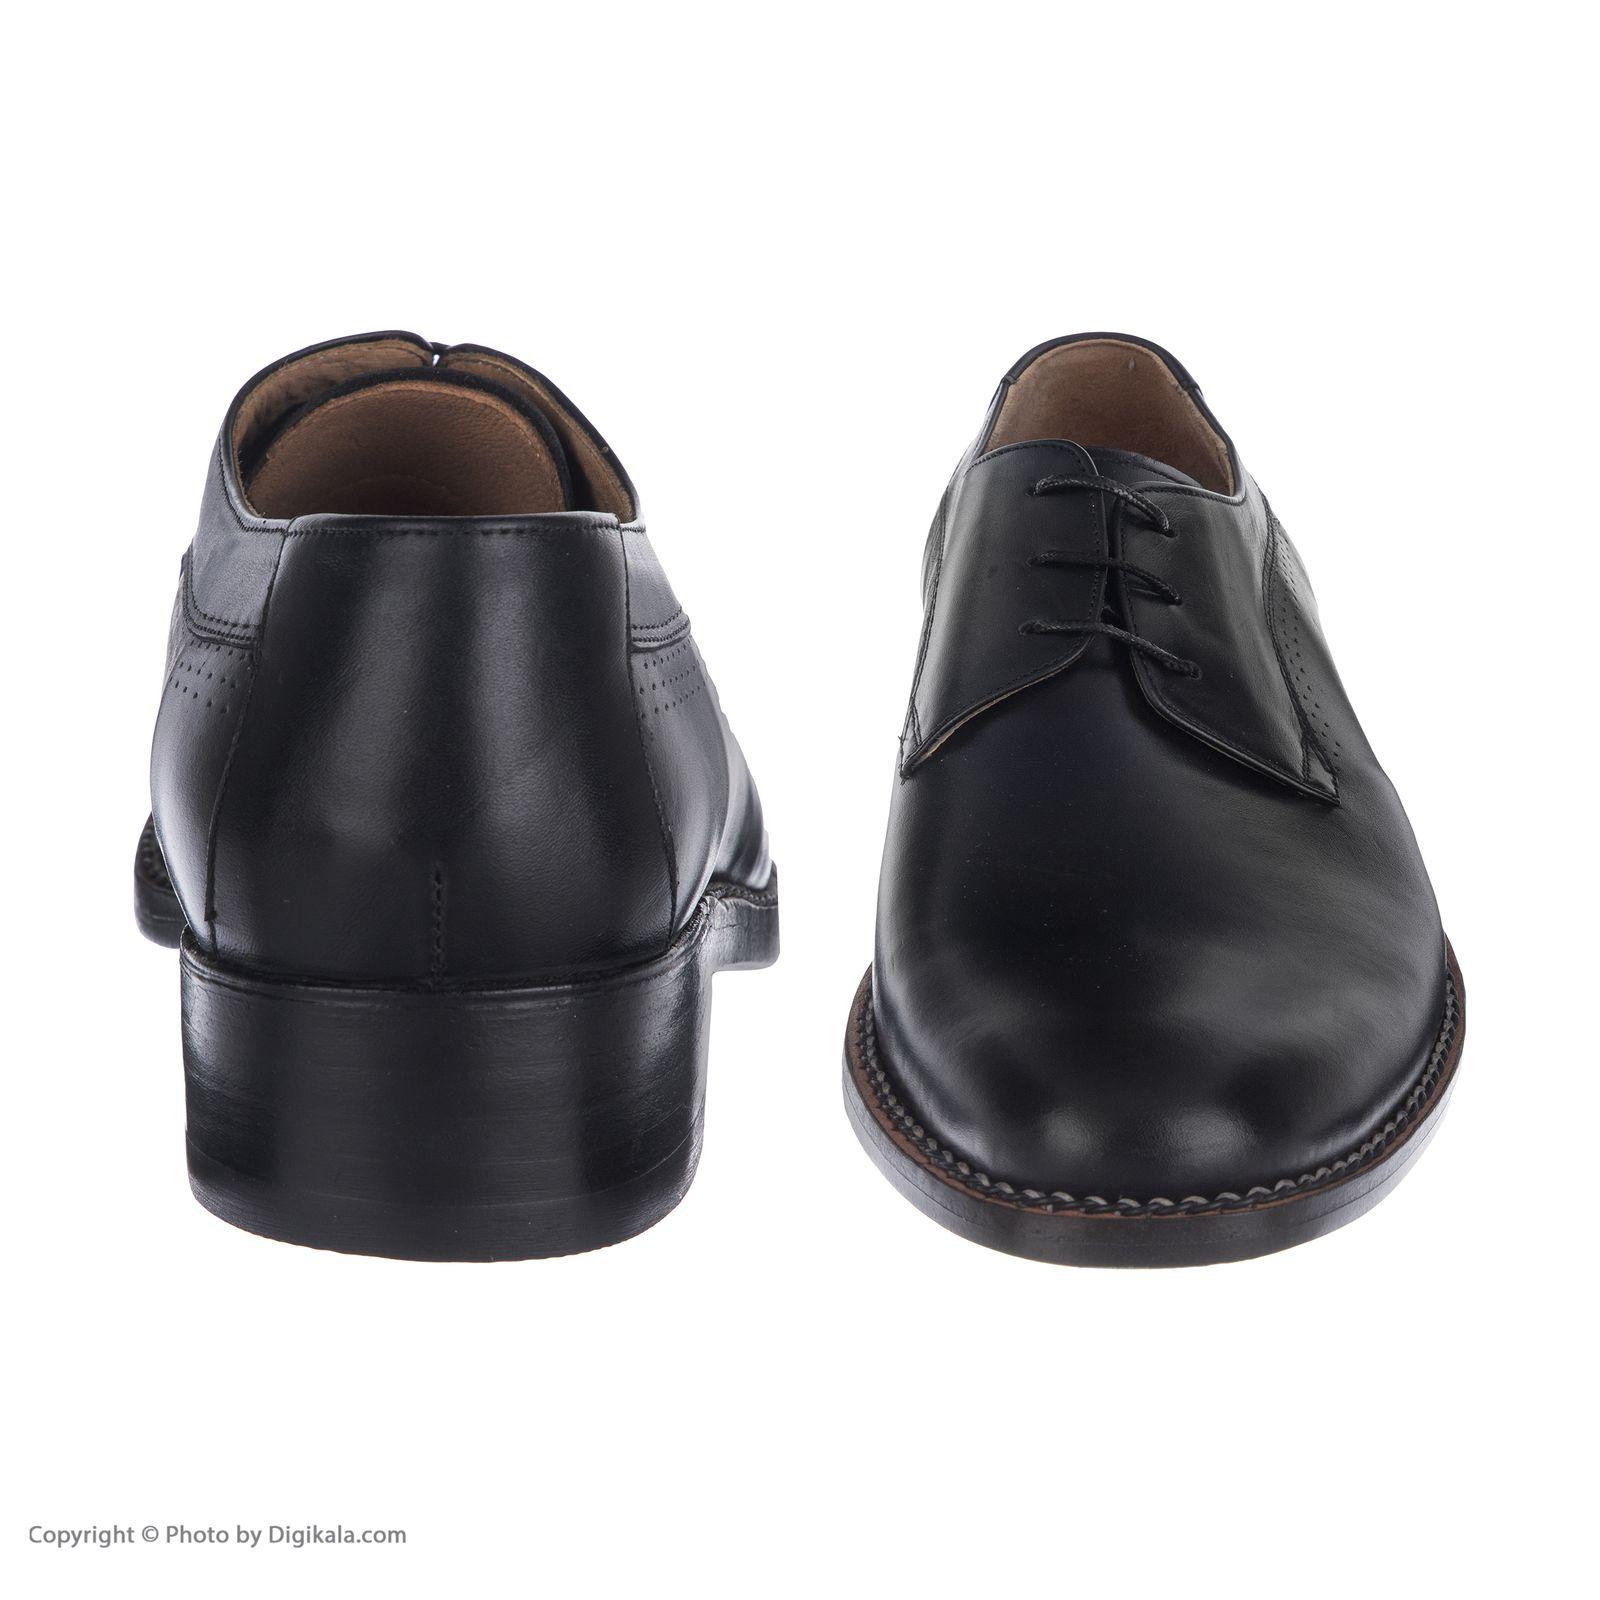 کفش مردانه نظری کد 405 -  - 2